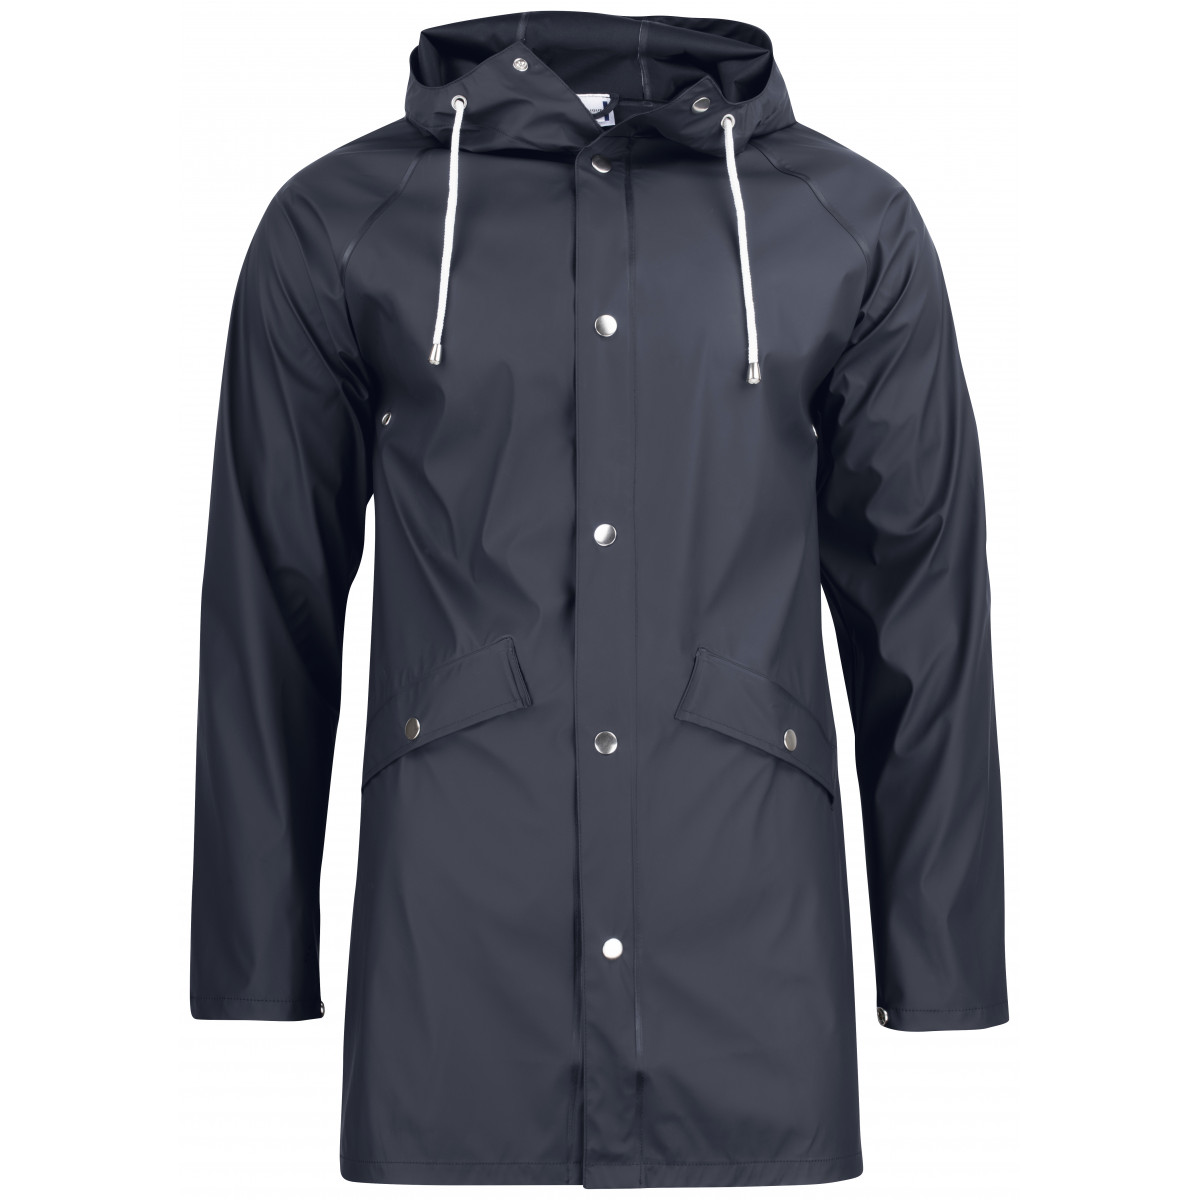 Дождевик унисекс 020939 Classic Rain Jacket - Темно-синий